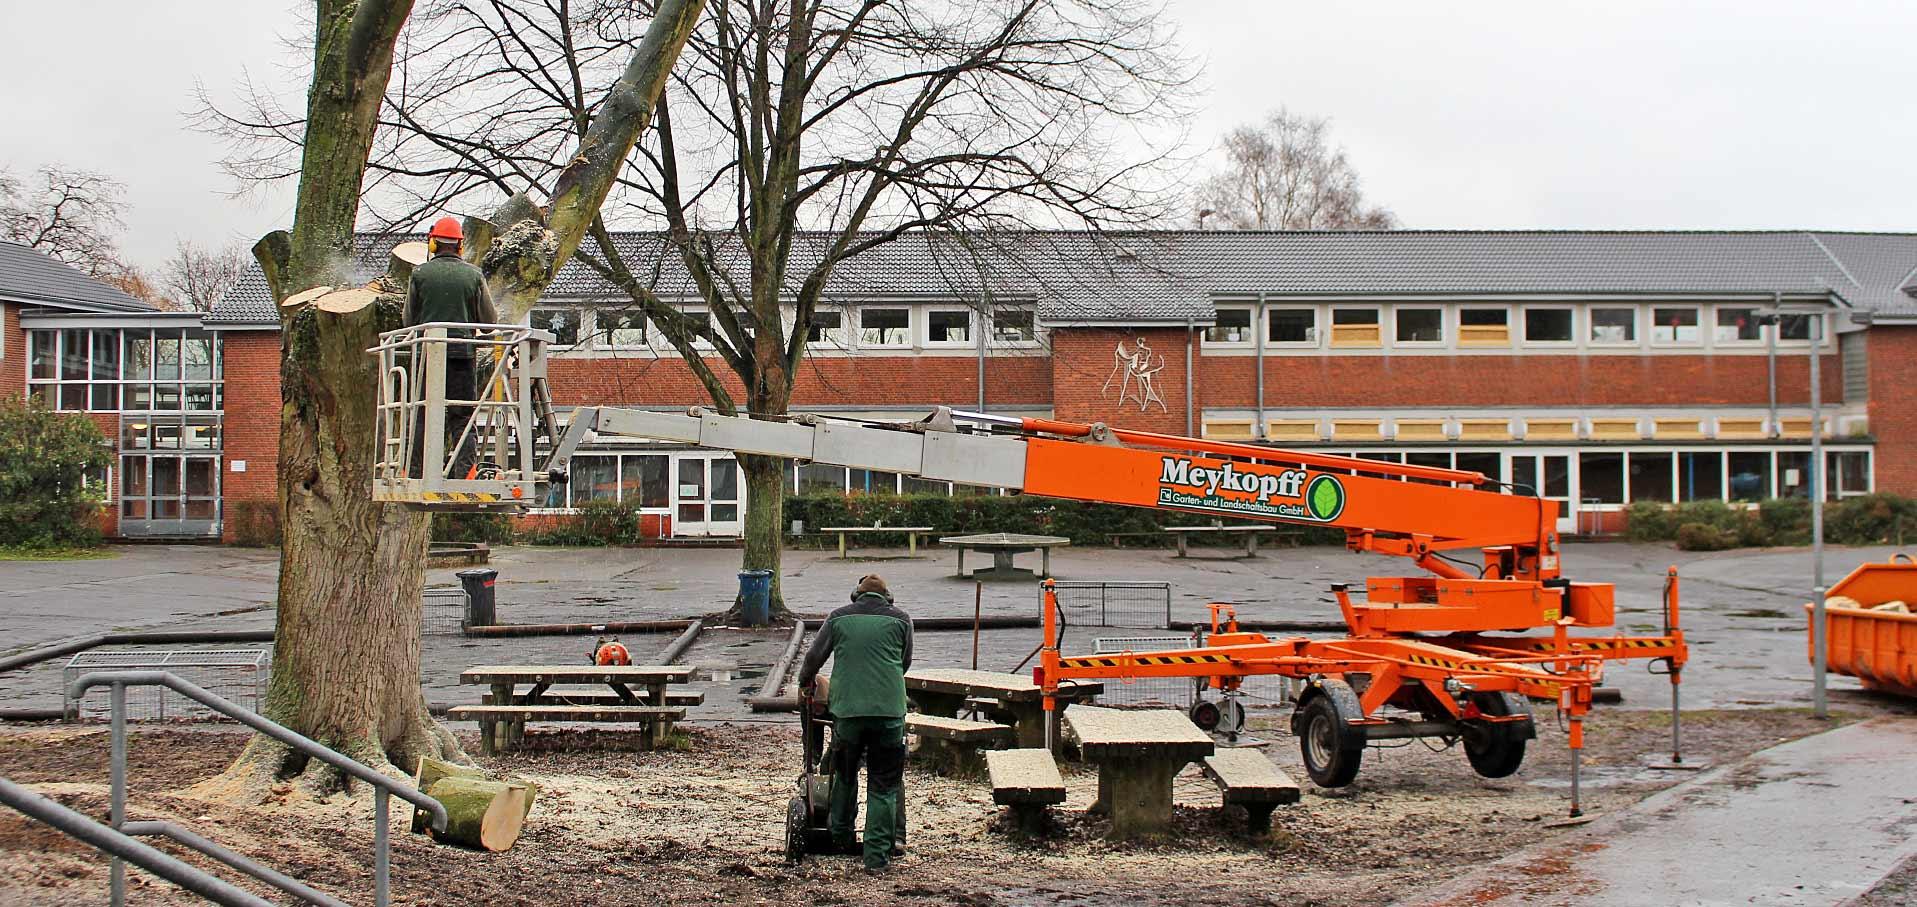 Bäume Fällen An Der Albert Schweitzer Schule Meykopff